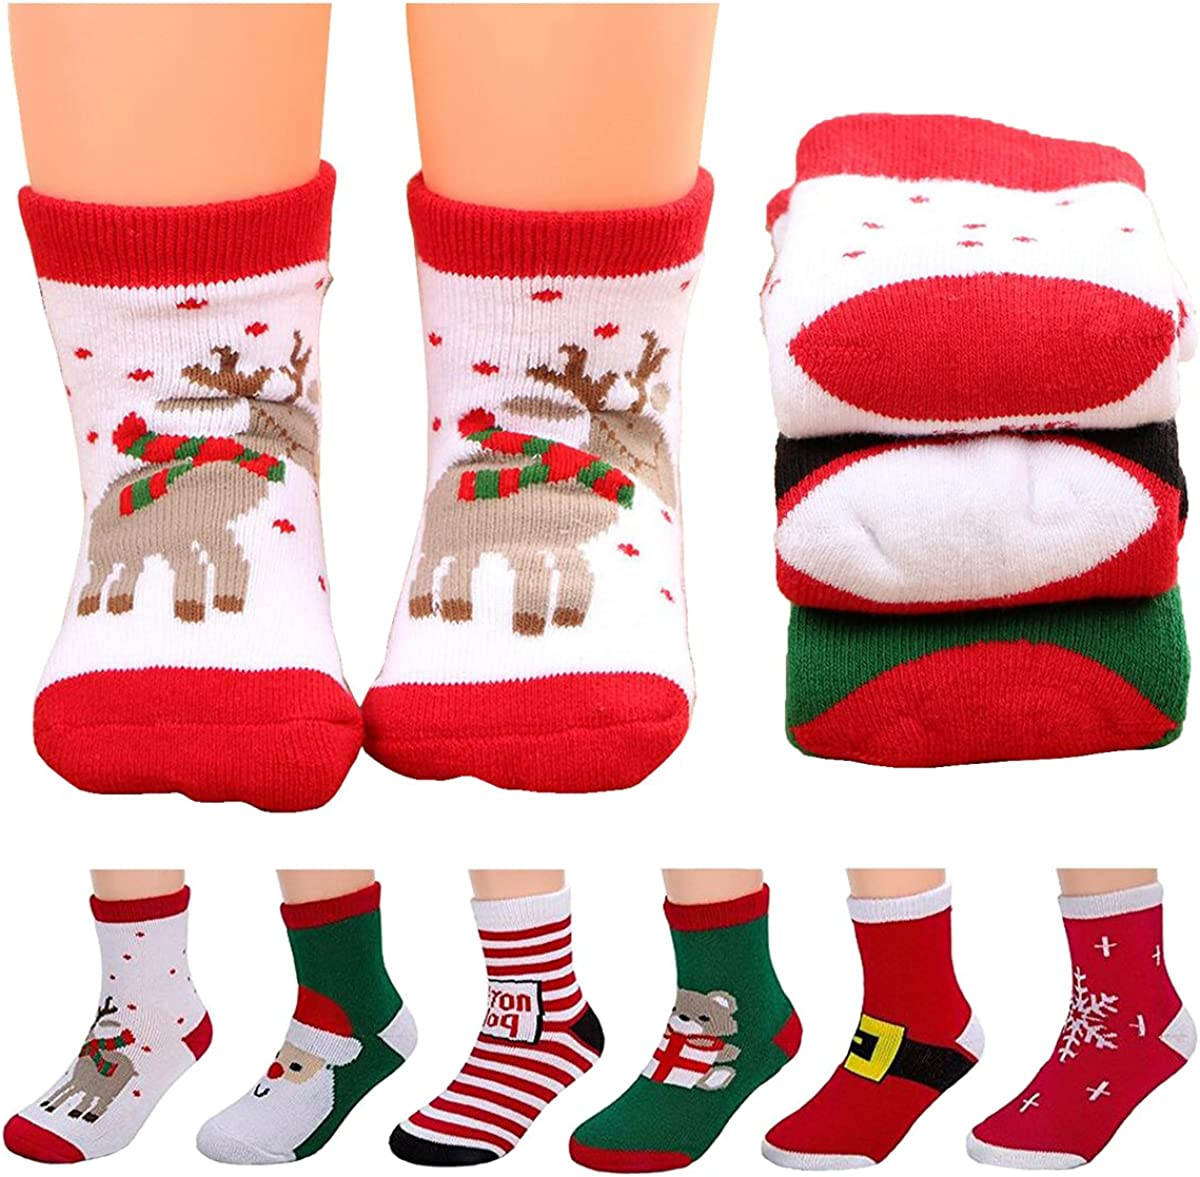 Christmas Socks,5 Pairs Cotton Cartoon NewBorn Infant Toddler Soft Sock